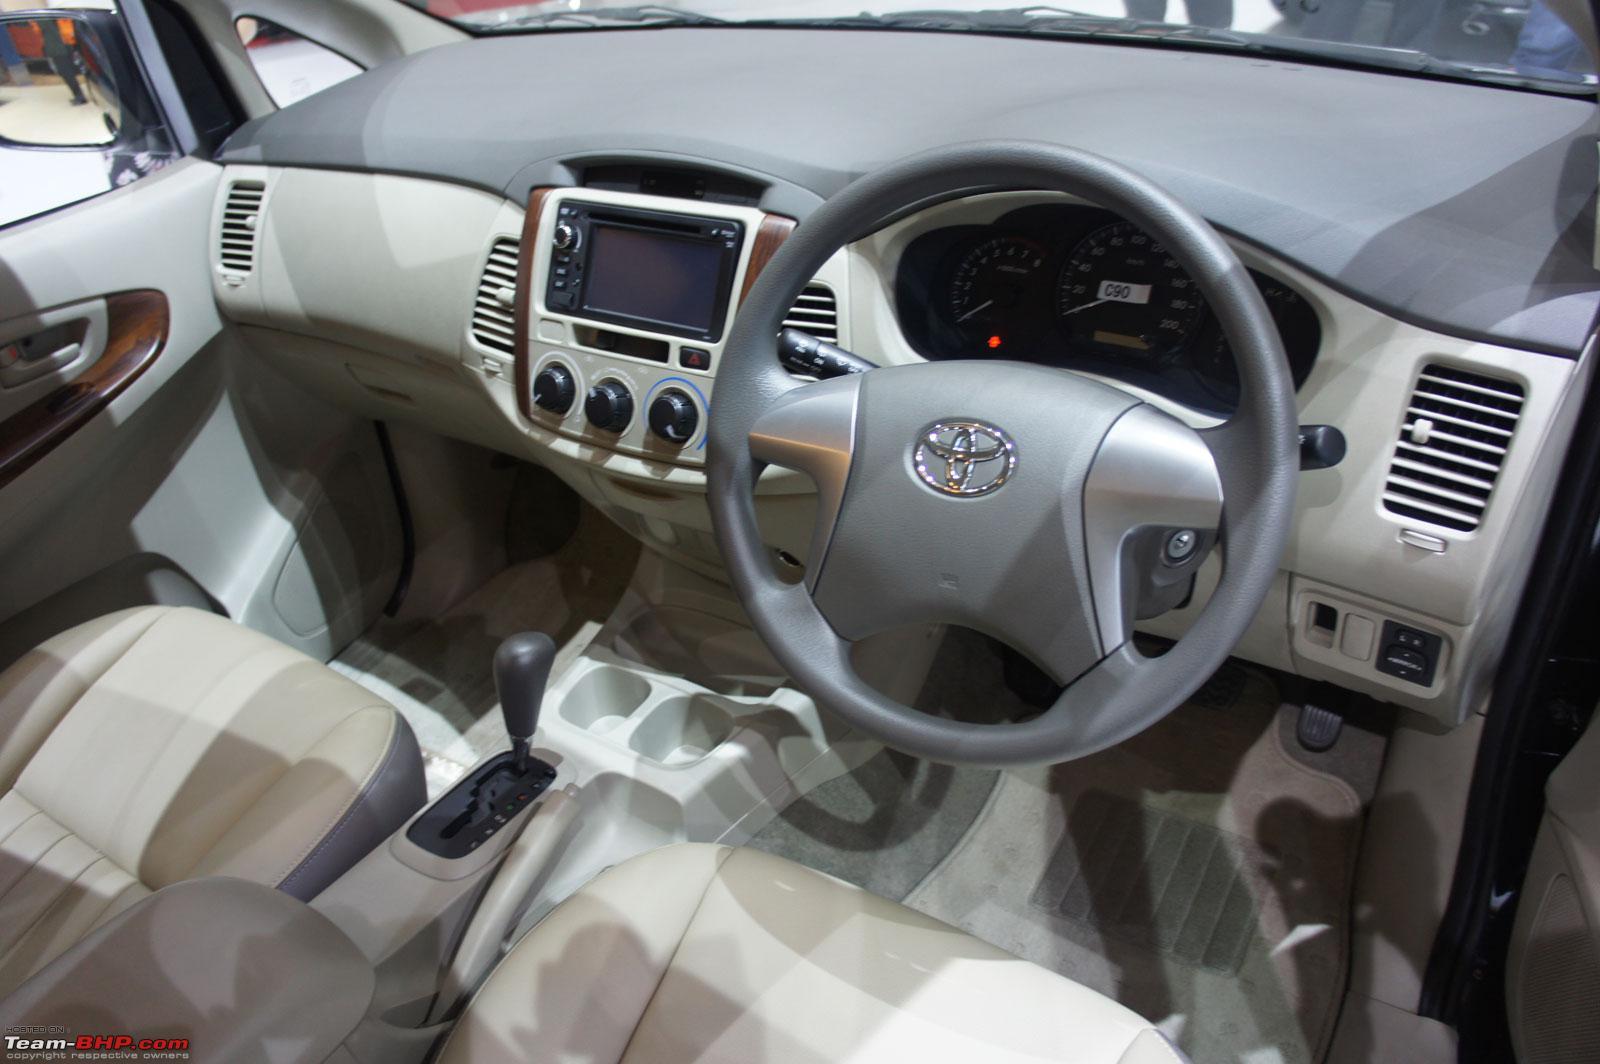 2012 Toyota Innova Facelift Unveiled Internationally